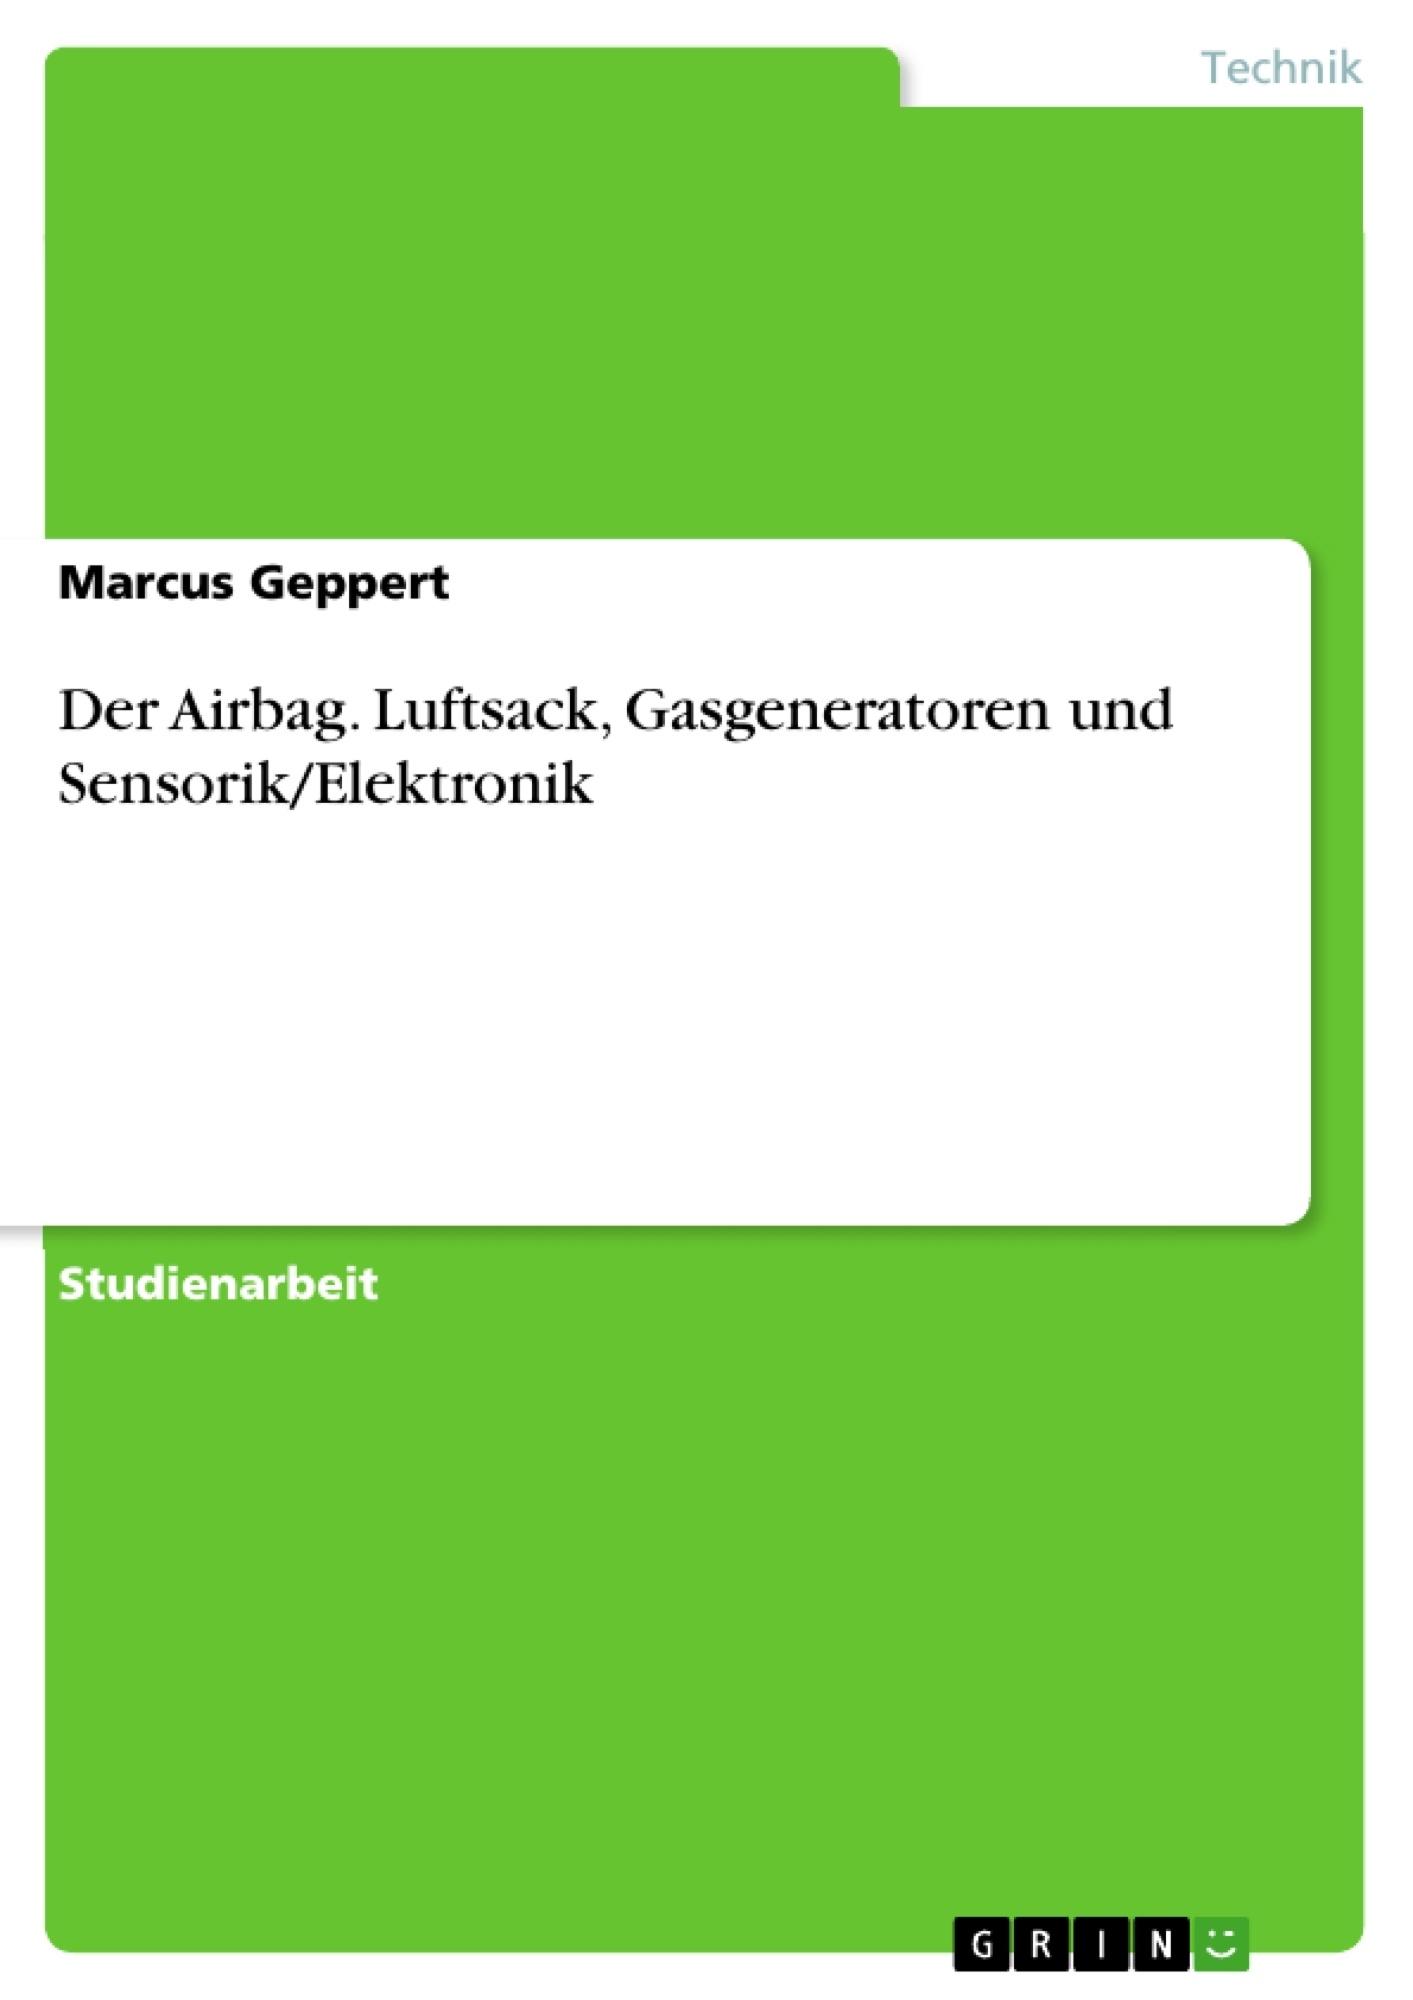 Titel: Der Airbag. Luftsack, Gasgeneratoren und Sensorik/Elektronik